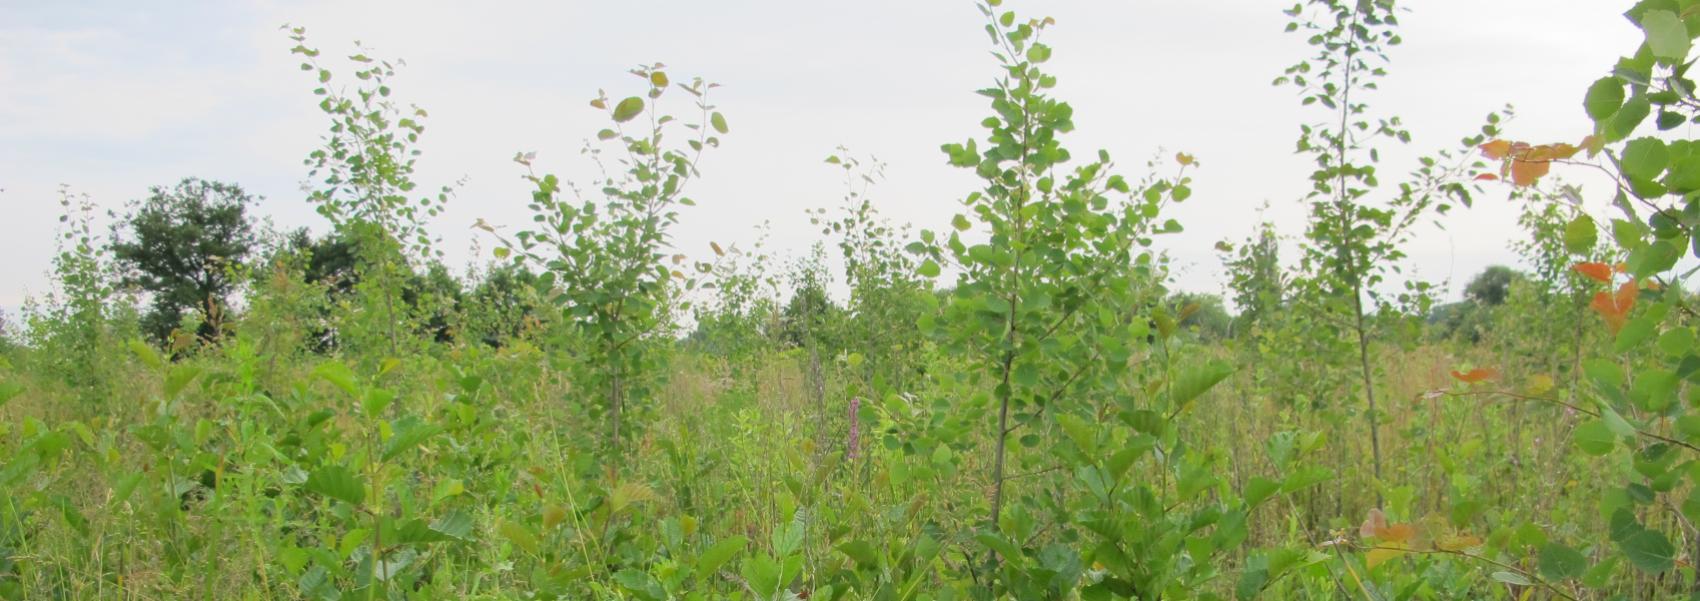 Jonge boompjes in het Parkbos